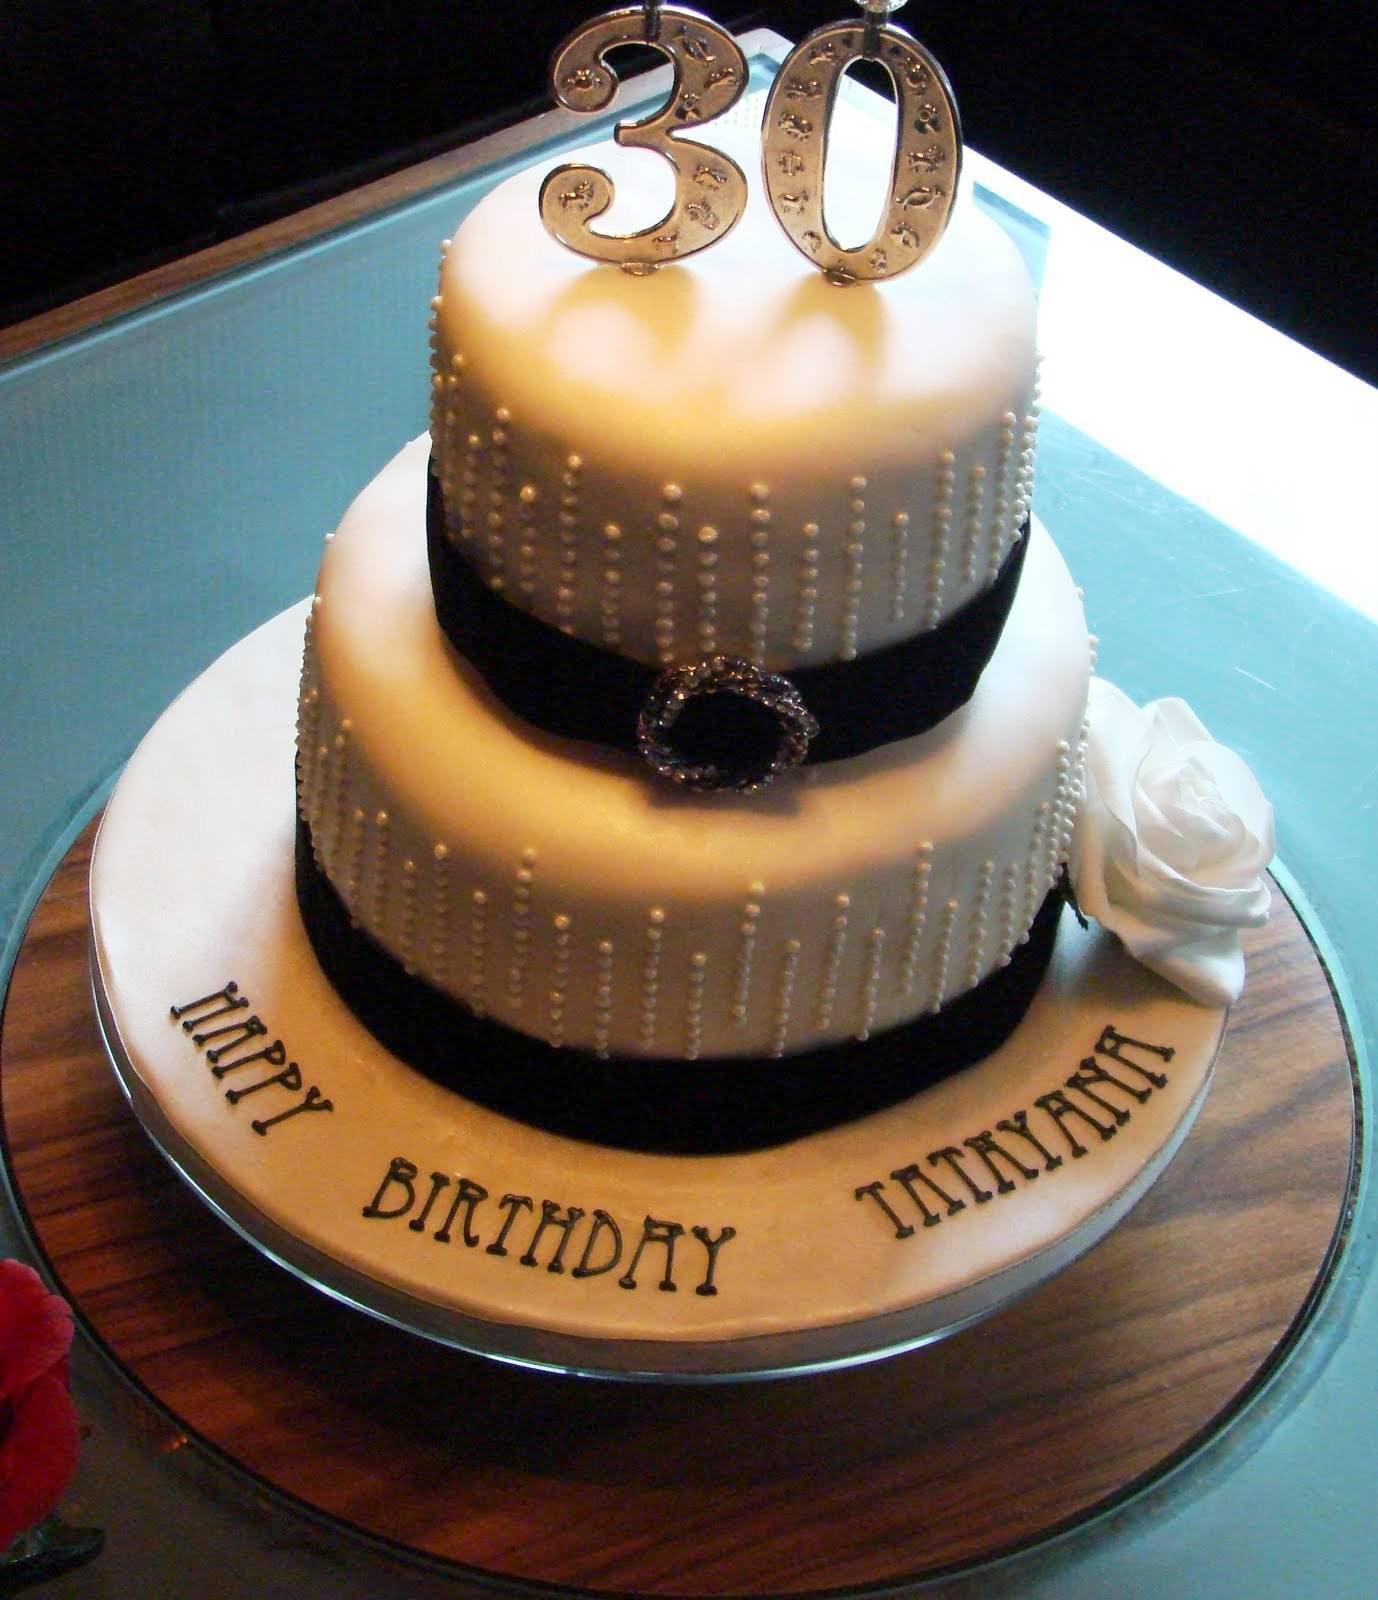 30th birthday cake ideas 30th birthday cake ideas for